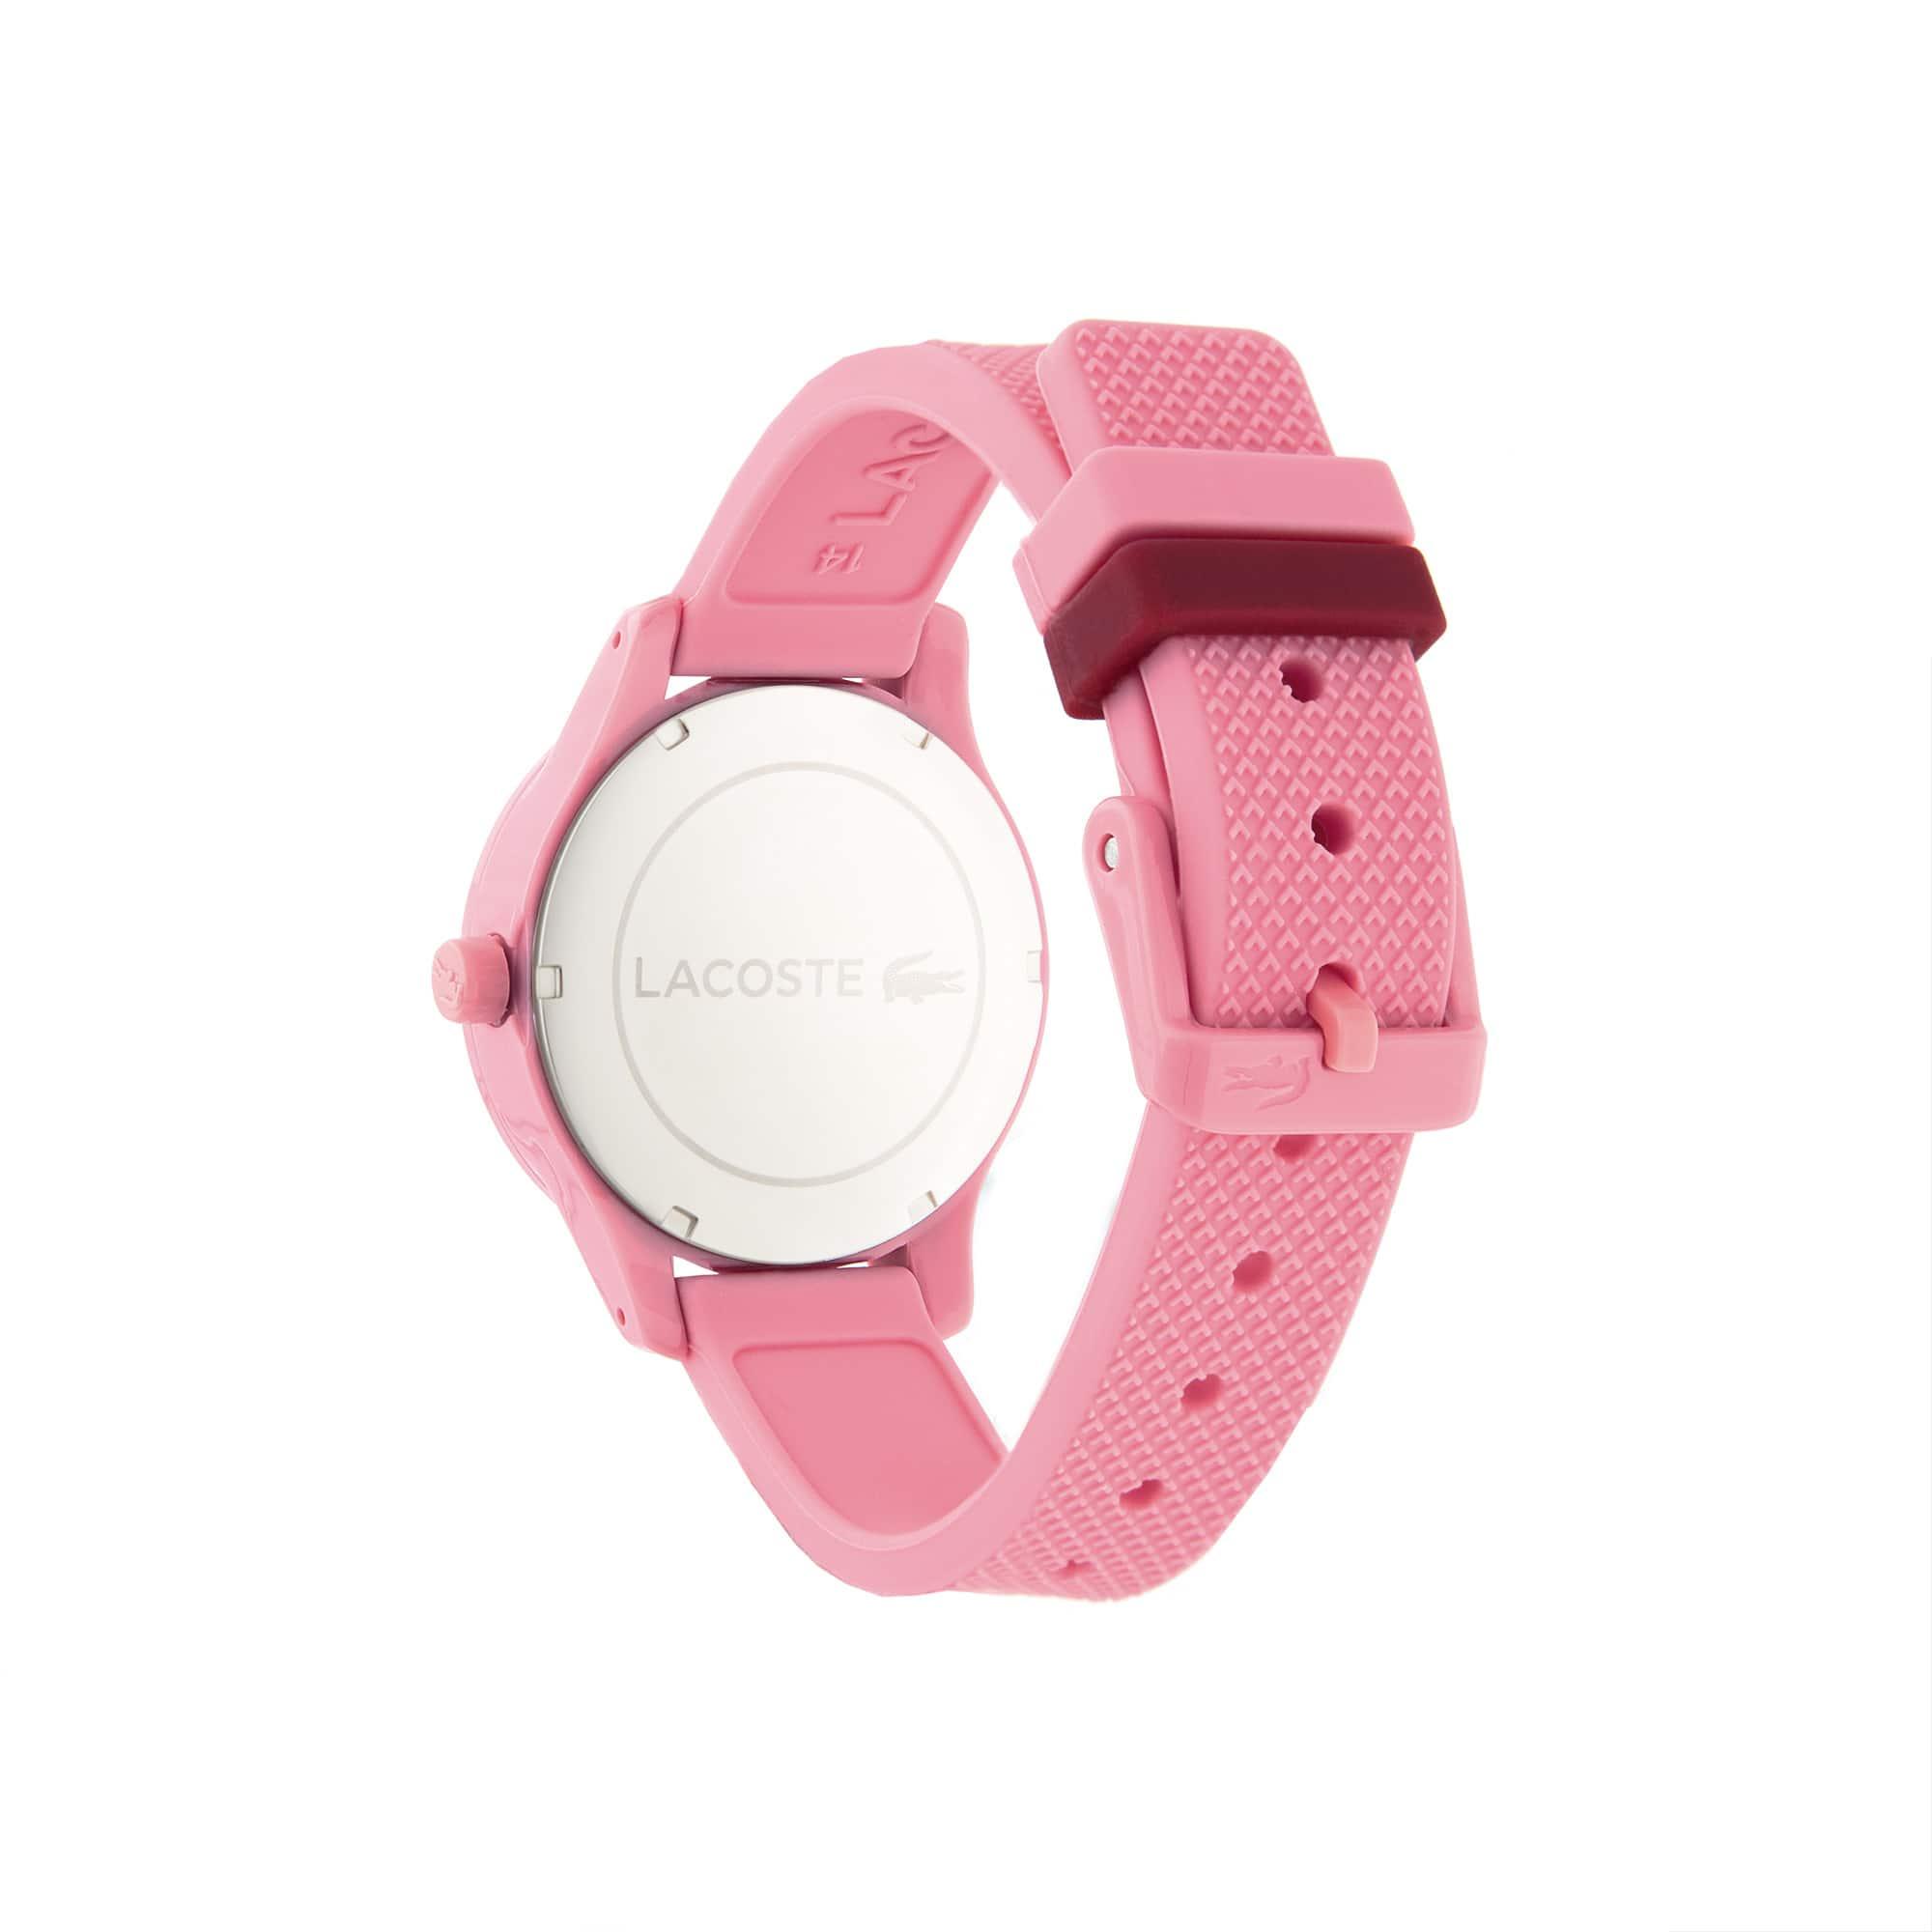 Lacoste - LACOSTE 12.12 Kinderuhr mit pinkem Silikonband - 4